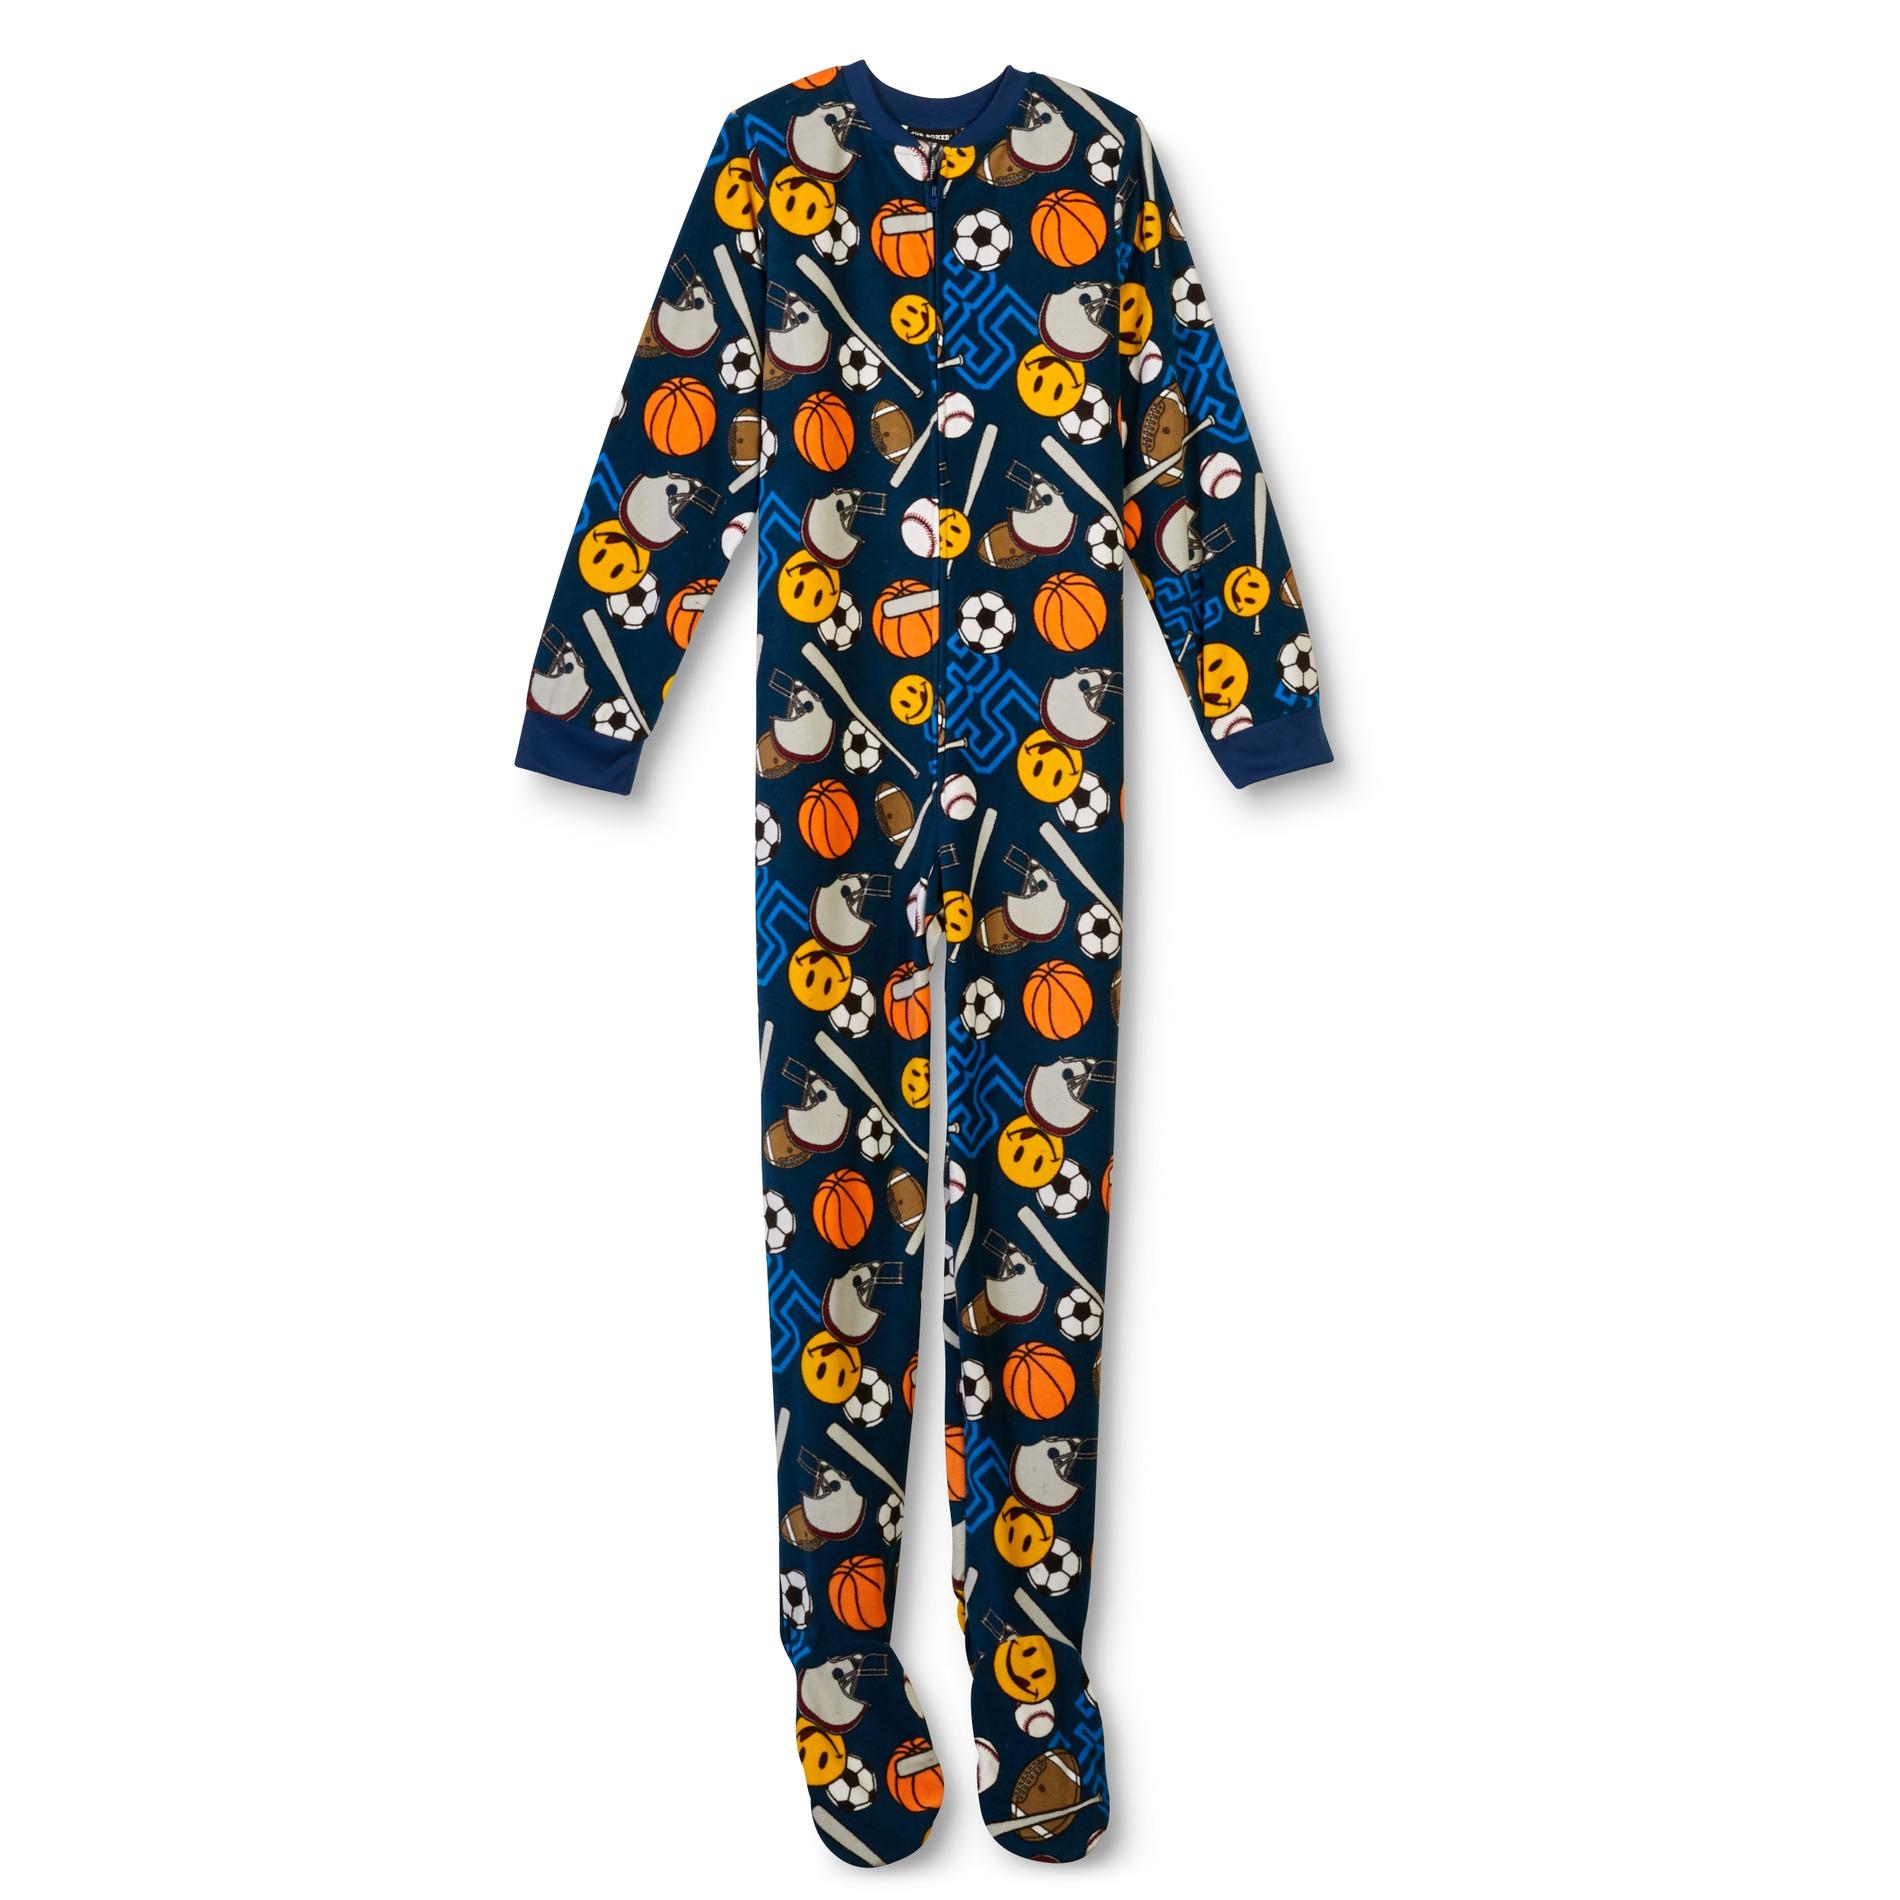 Joe Boxer Boy' Fleece Footed Pajamas - Sports Sears